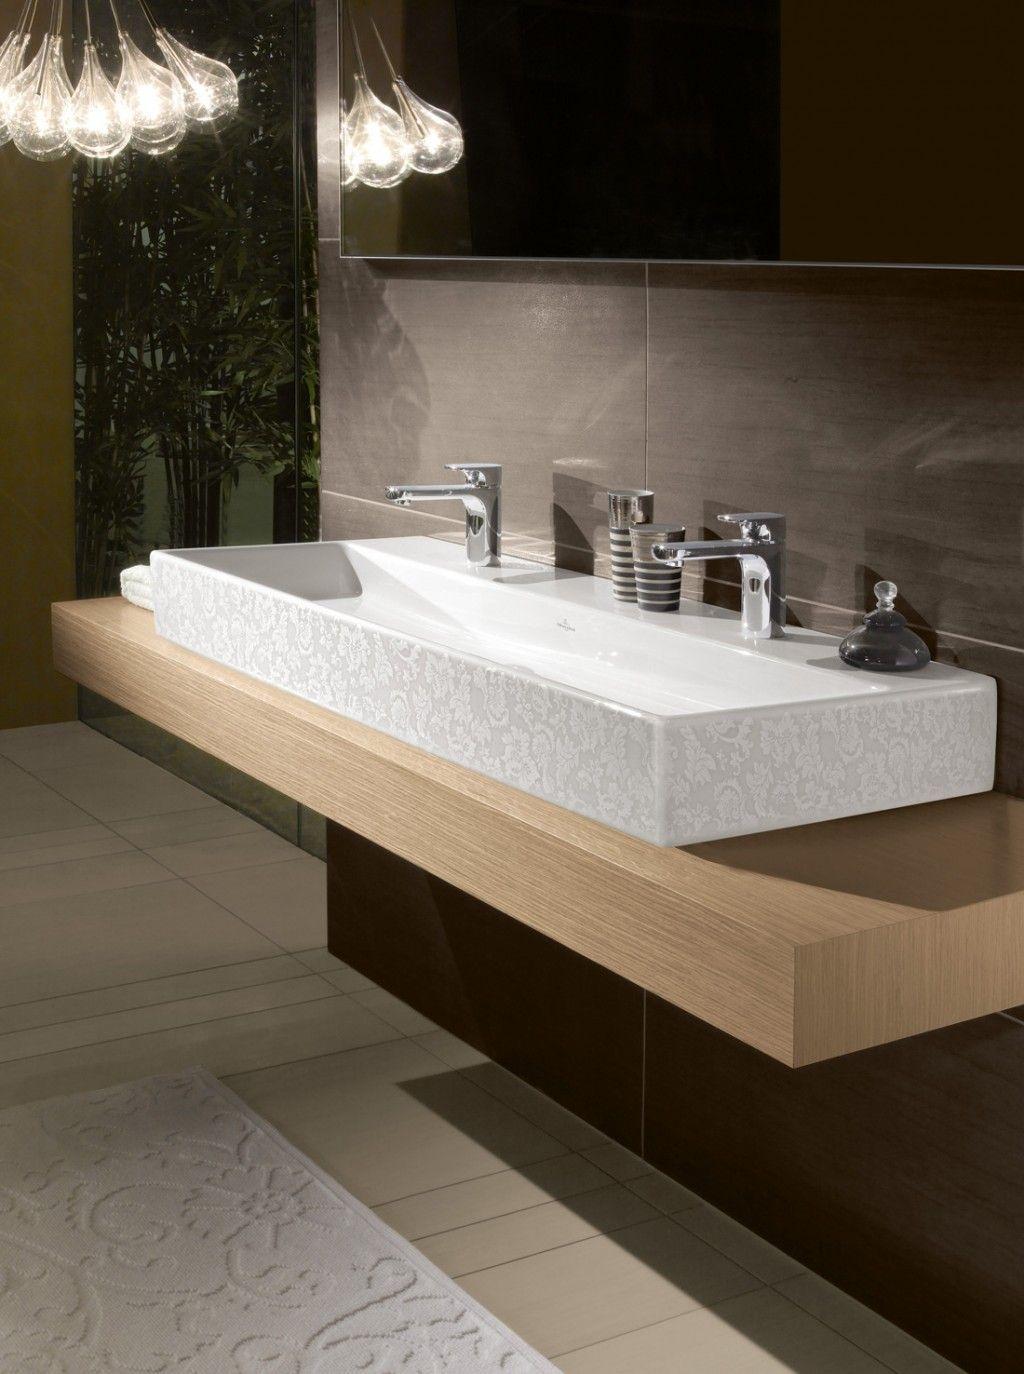 Bathroom White Memento Washbasin The New Glory Memento Washbasin